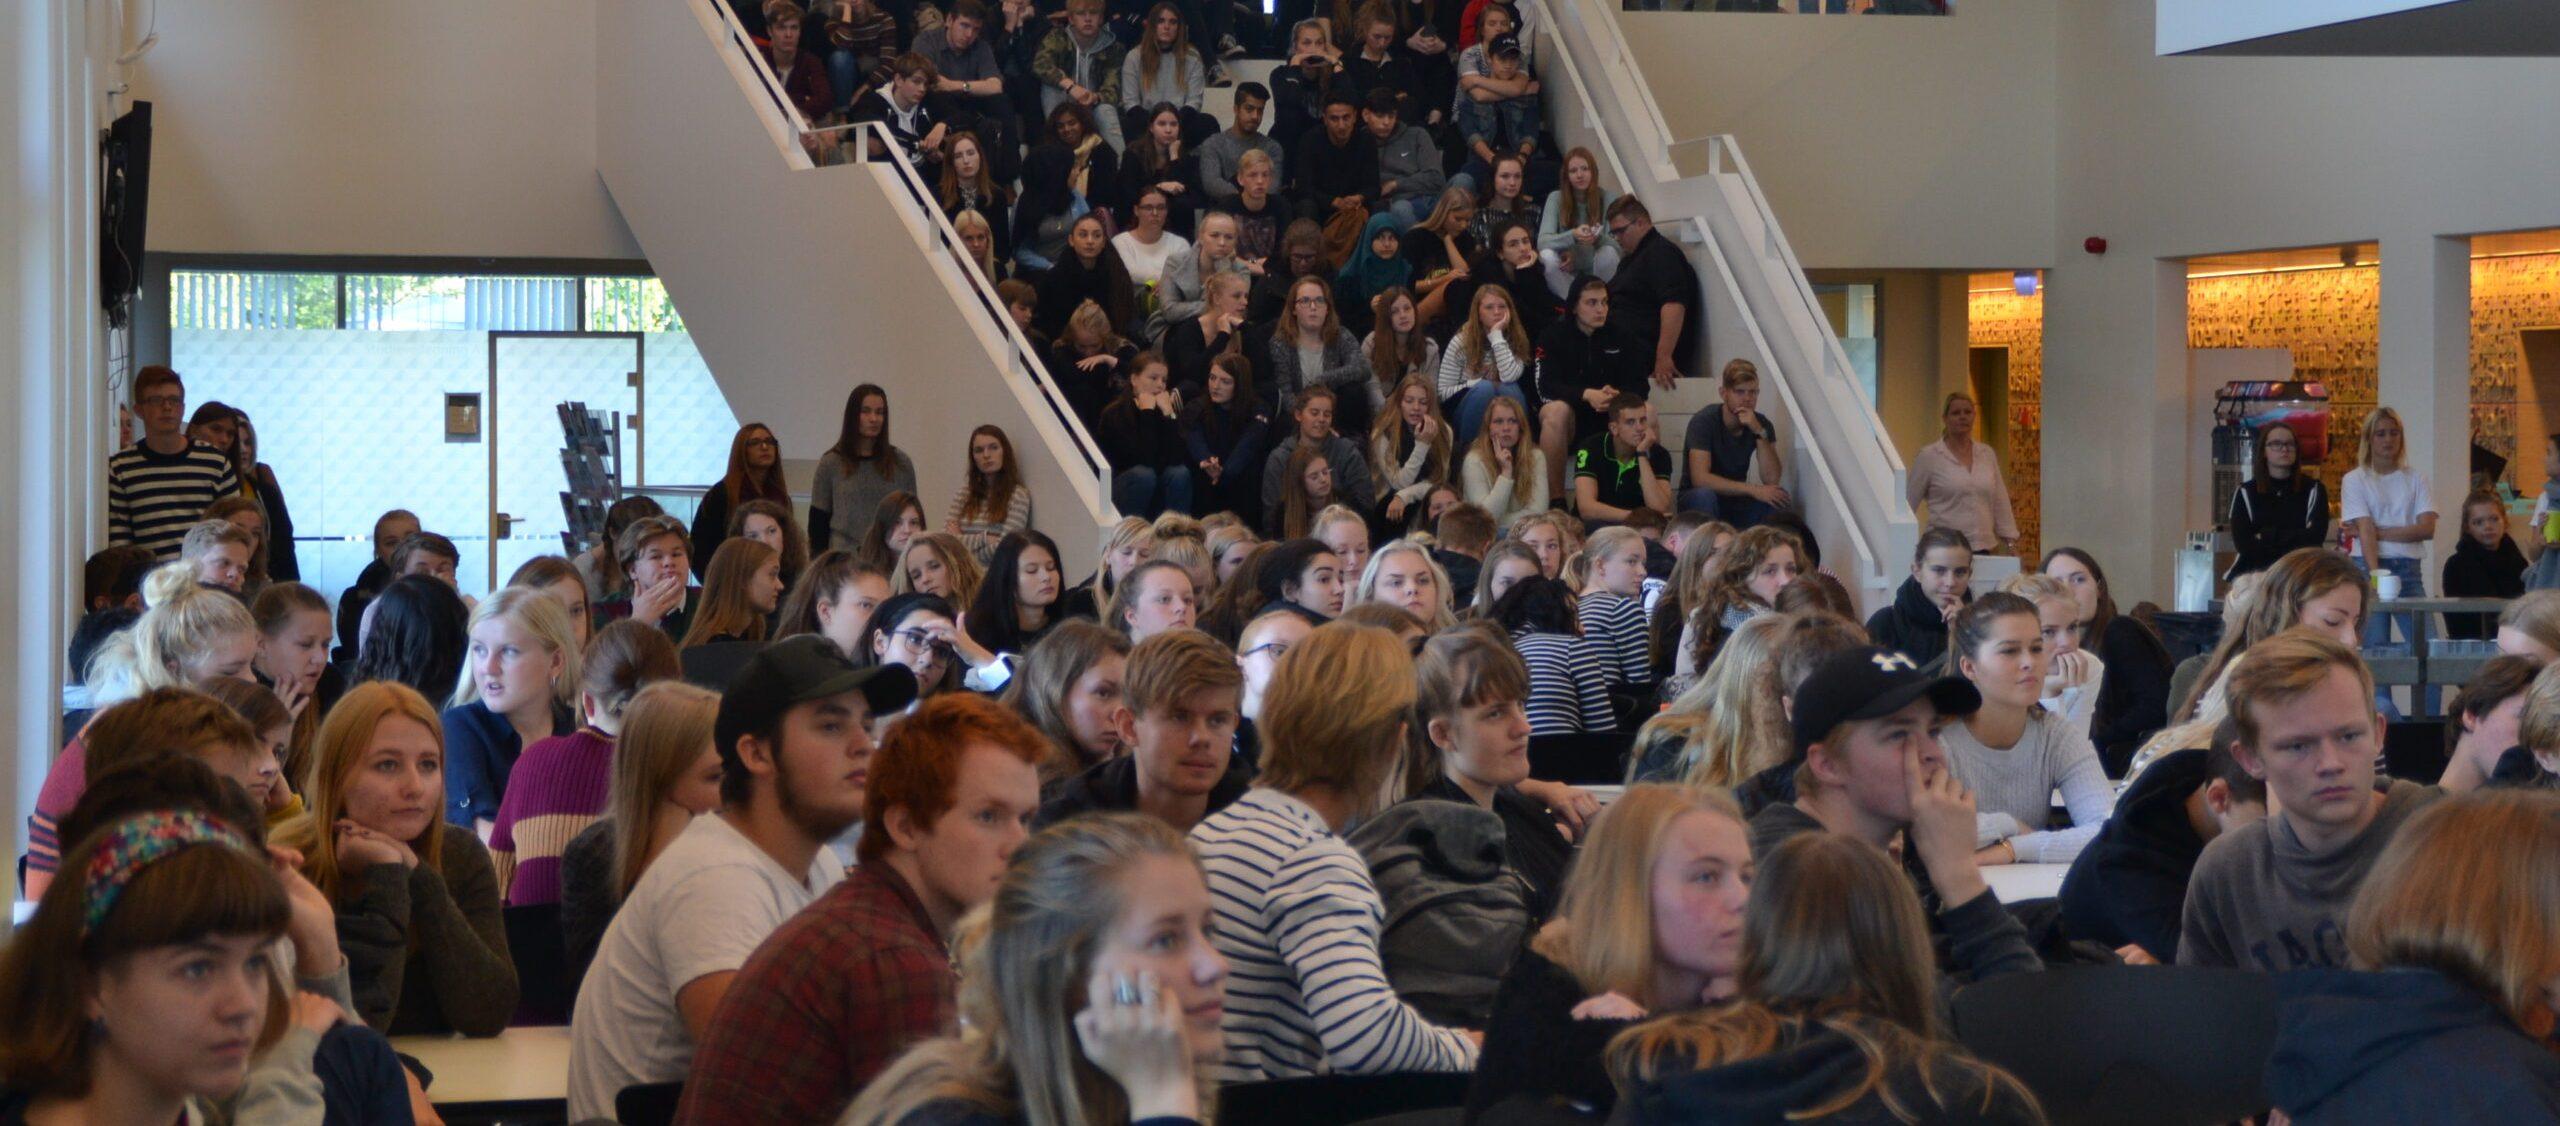 MidtsjællandsGymnasium